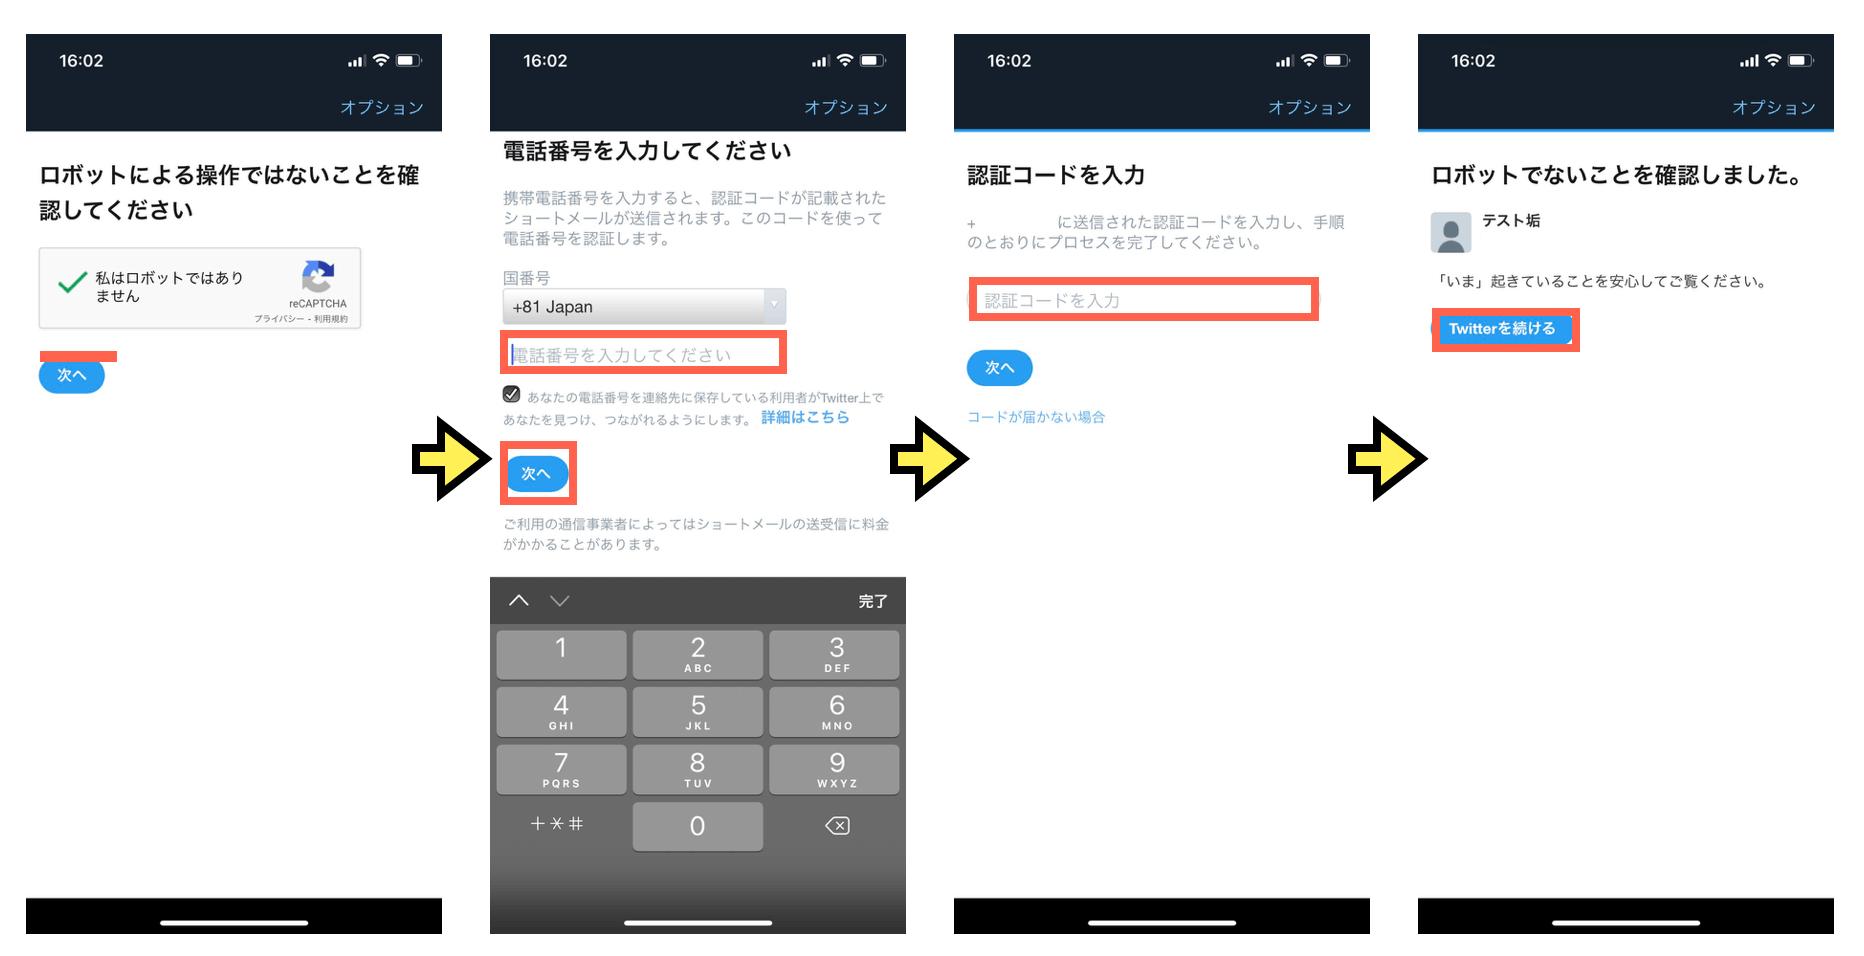 Twitter アカウント 復活 2